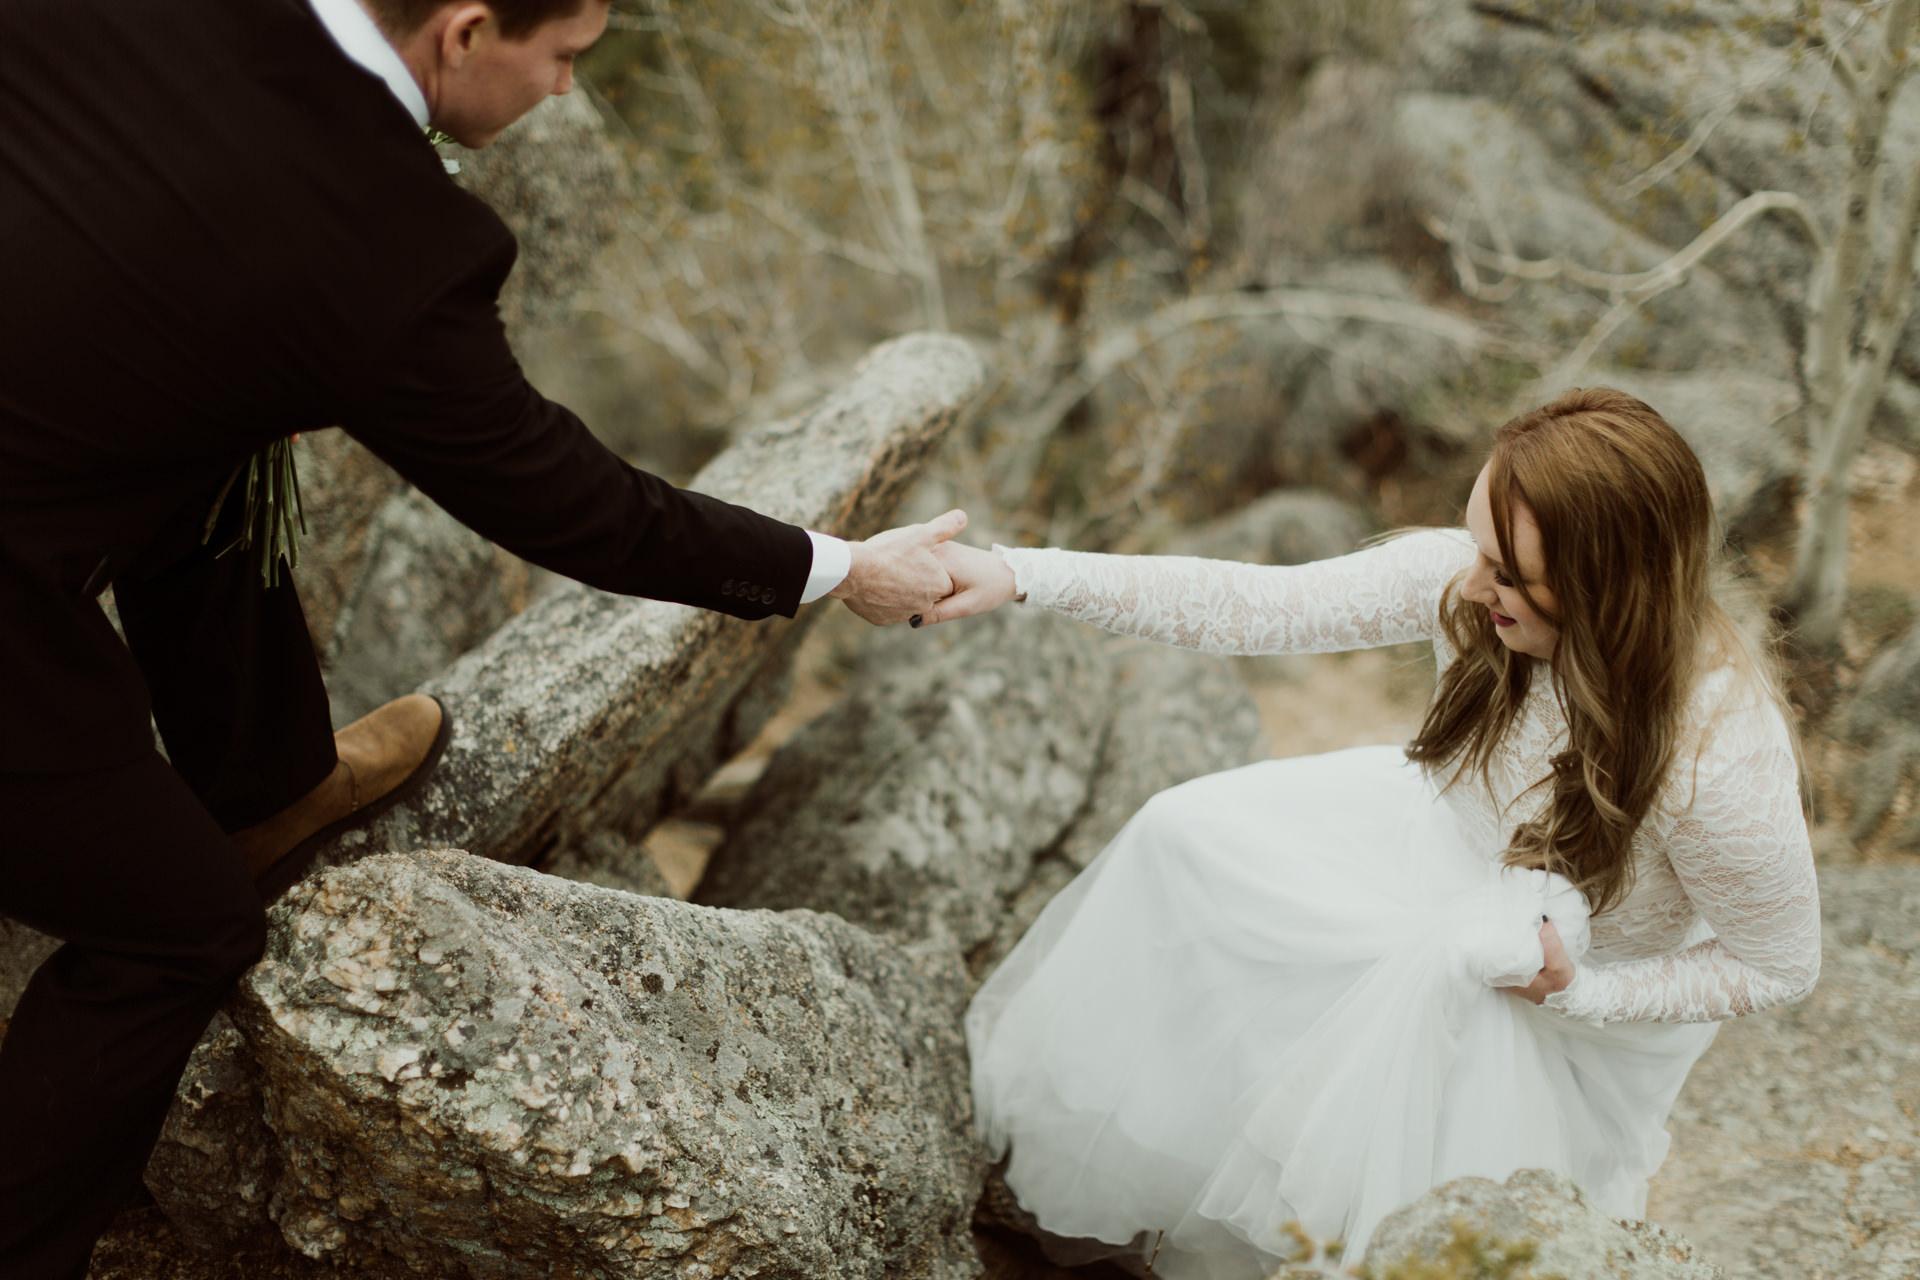 colorado-mount-evans-intimate-adventurous-elopement-8.jpg